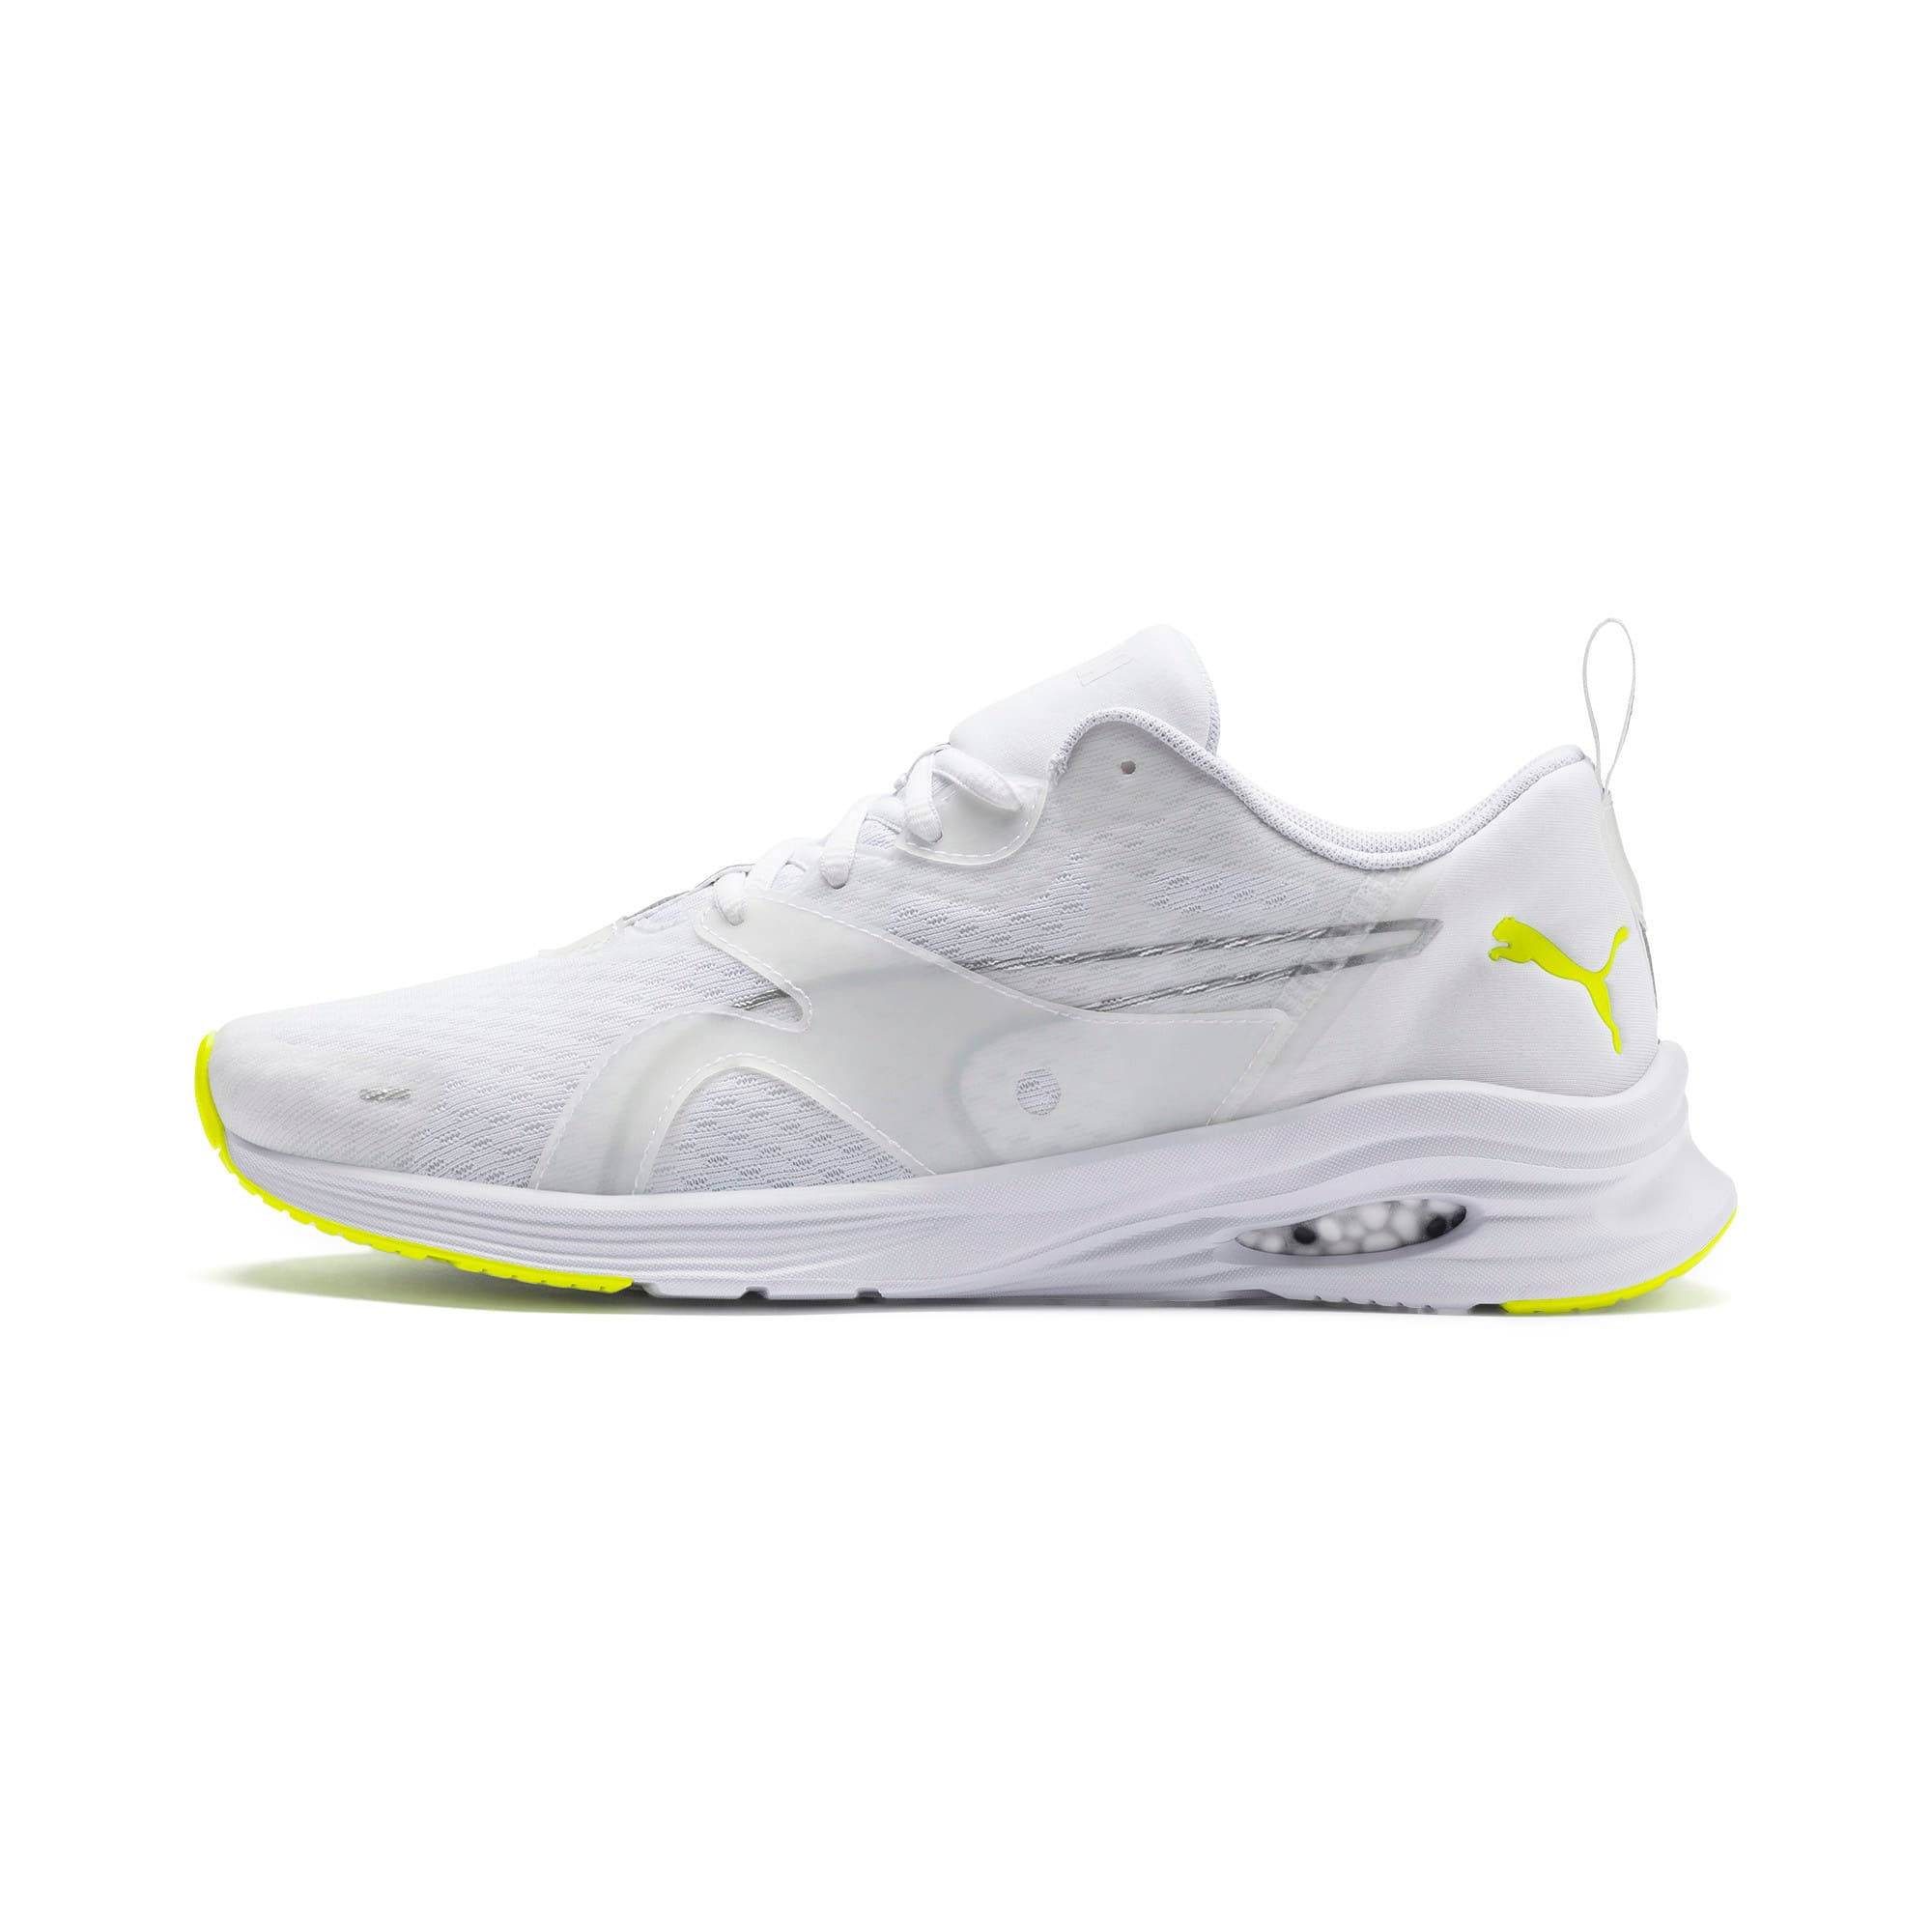 Thumbnail 1 of HYBRID Fuego Men's Running Shoes, Puma White-Yellow Alert, medium